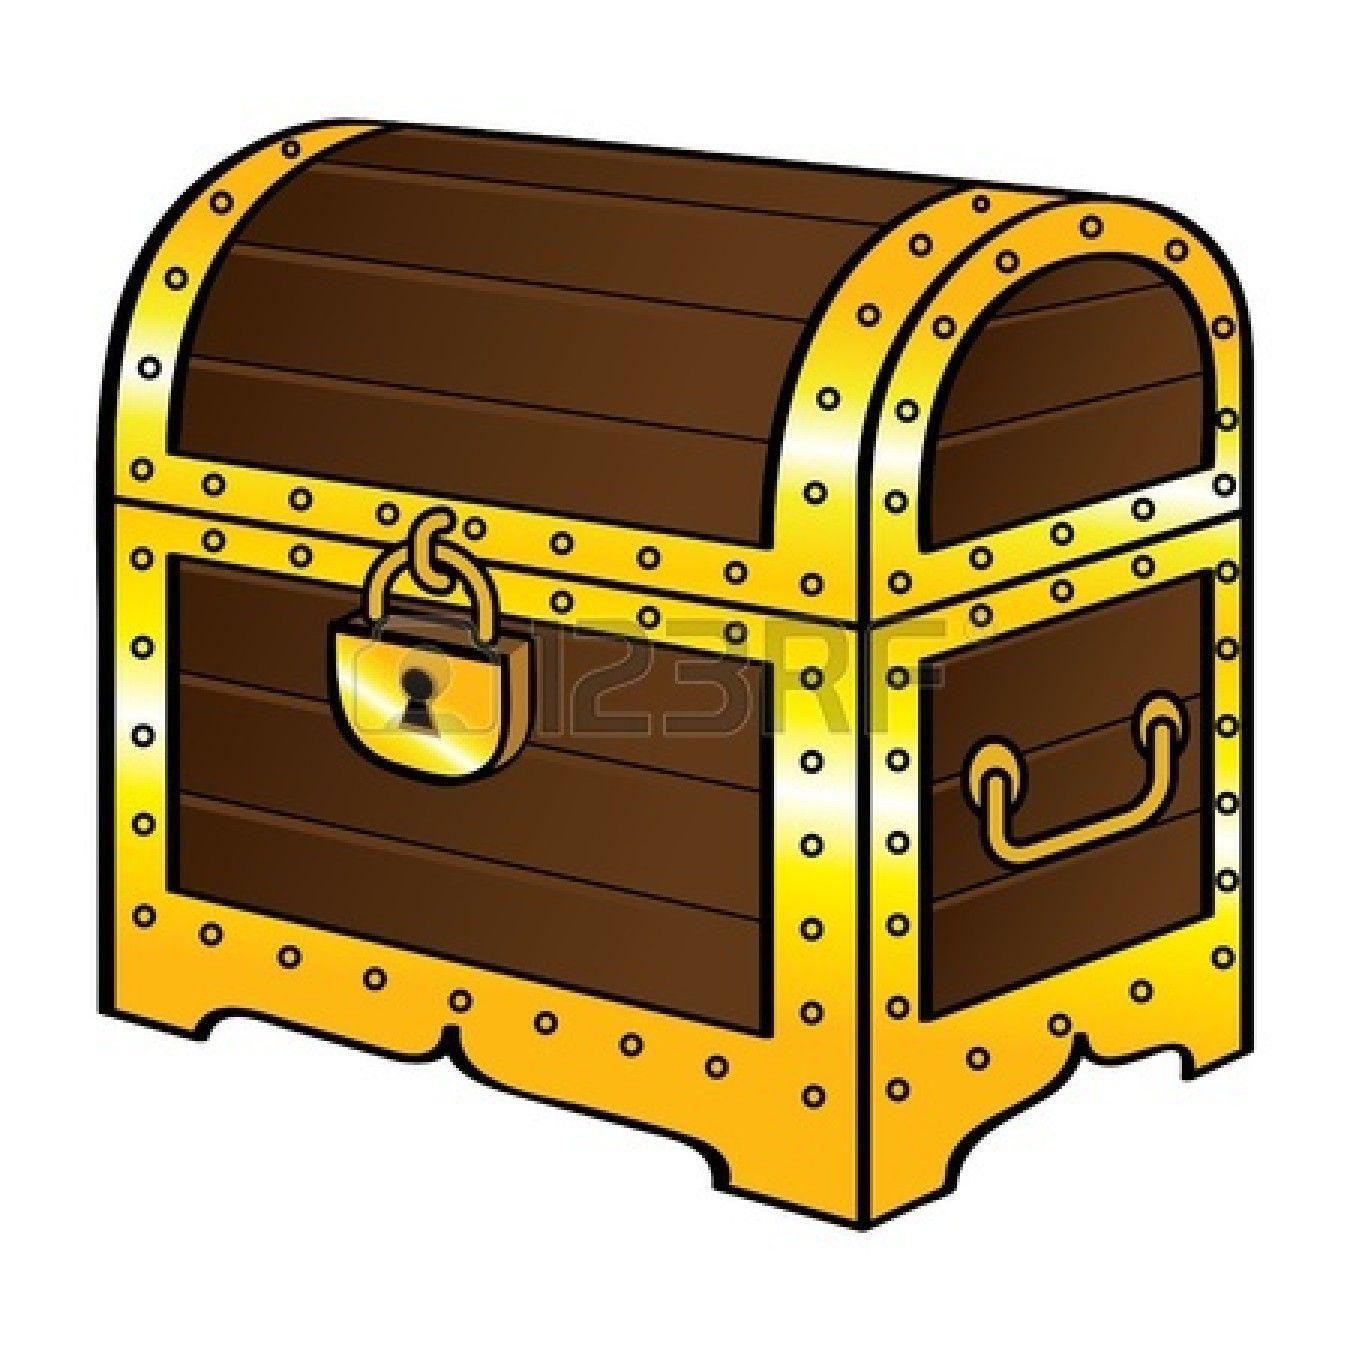 Treasure Chest Stock Vector Illustration And Royalty Free Treasure.